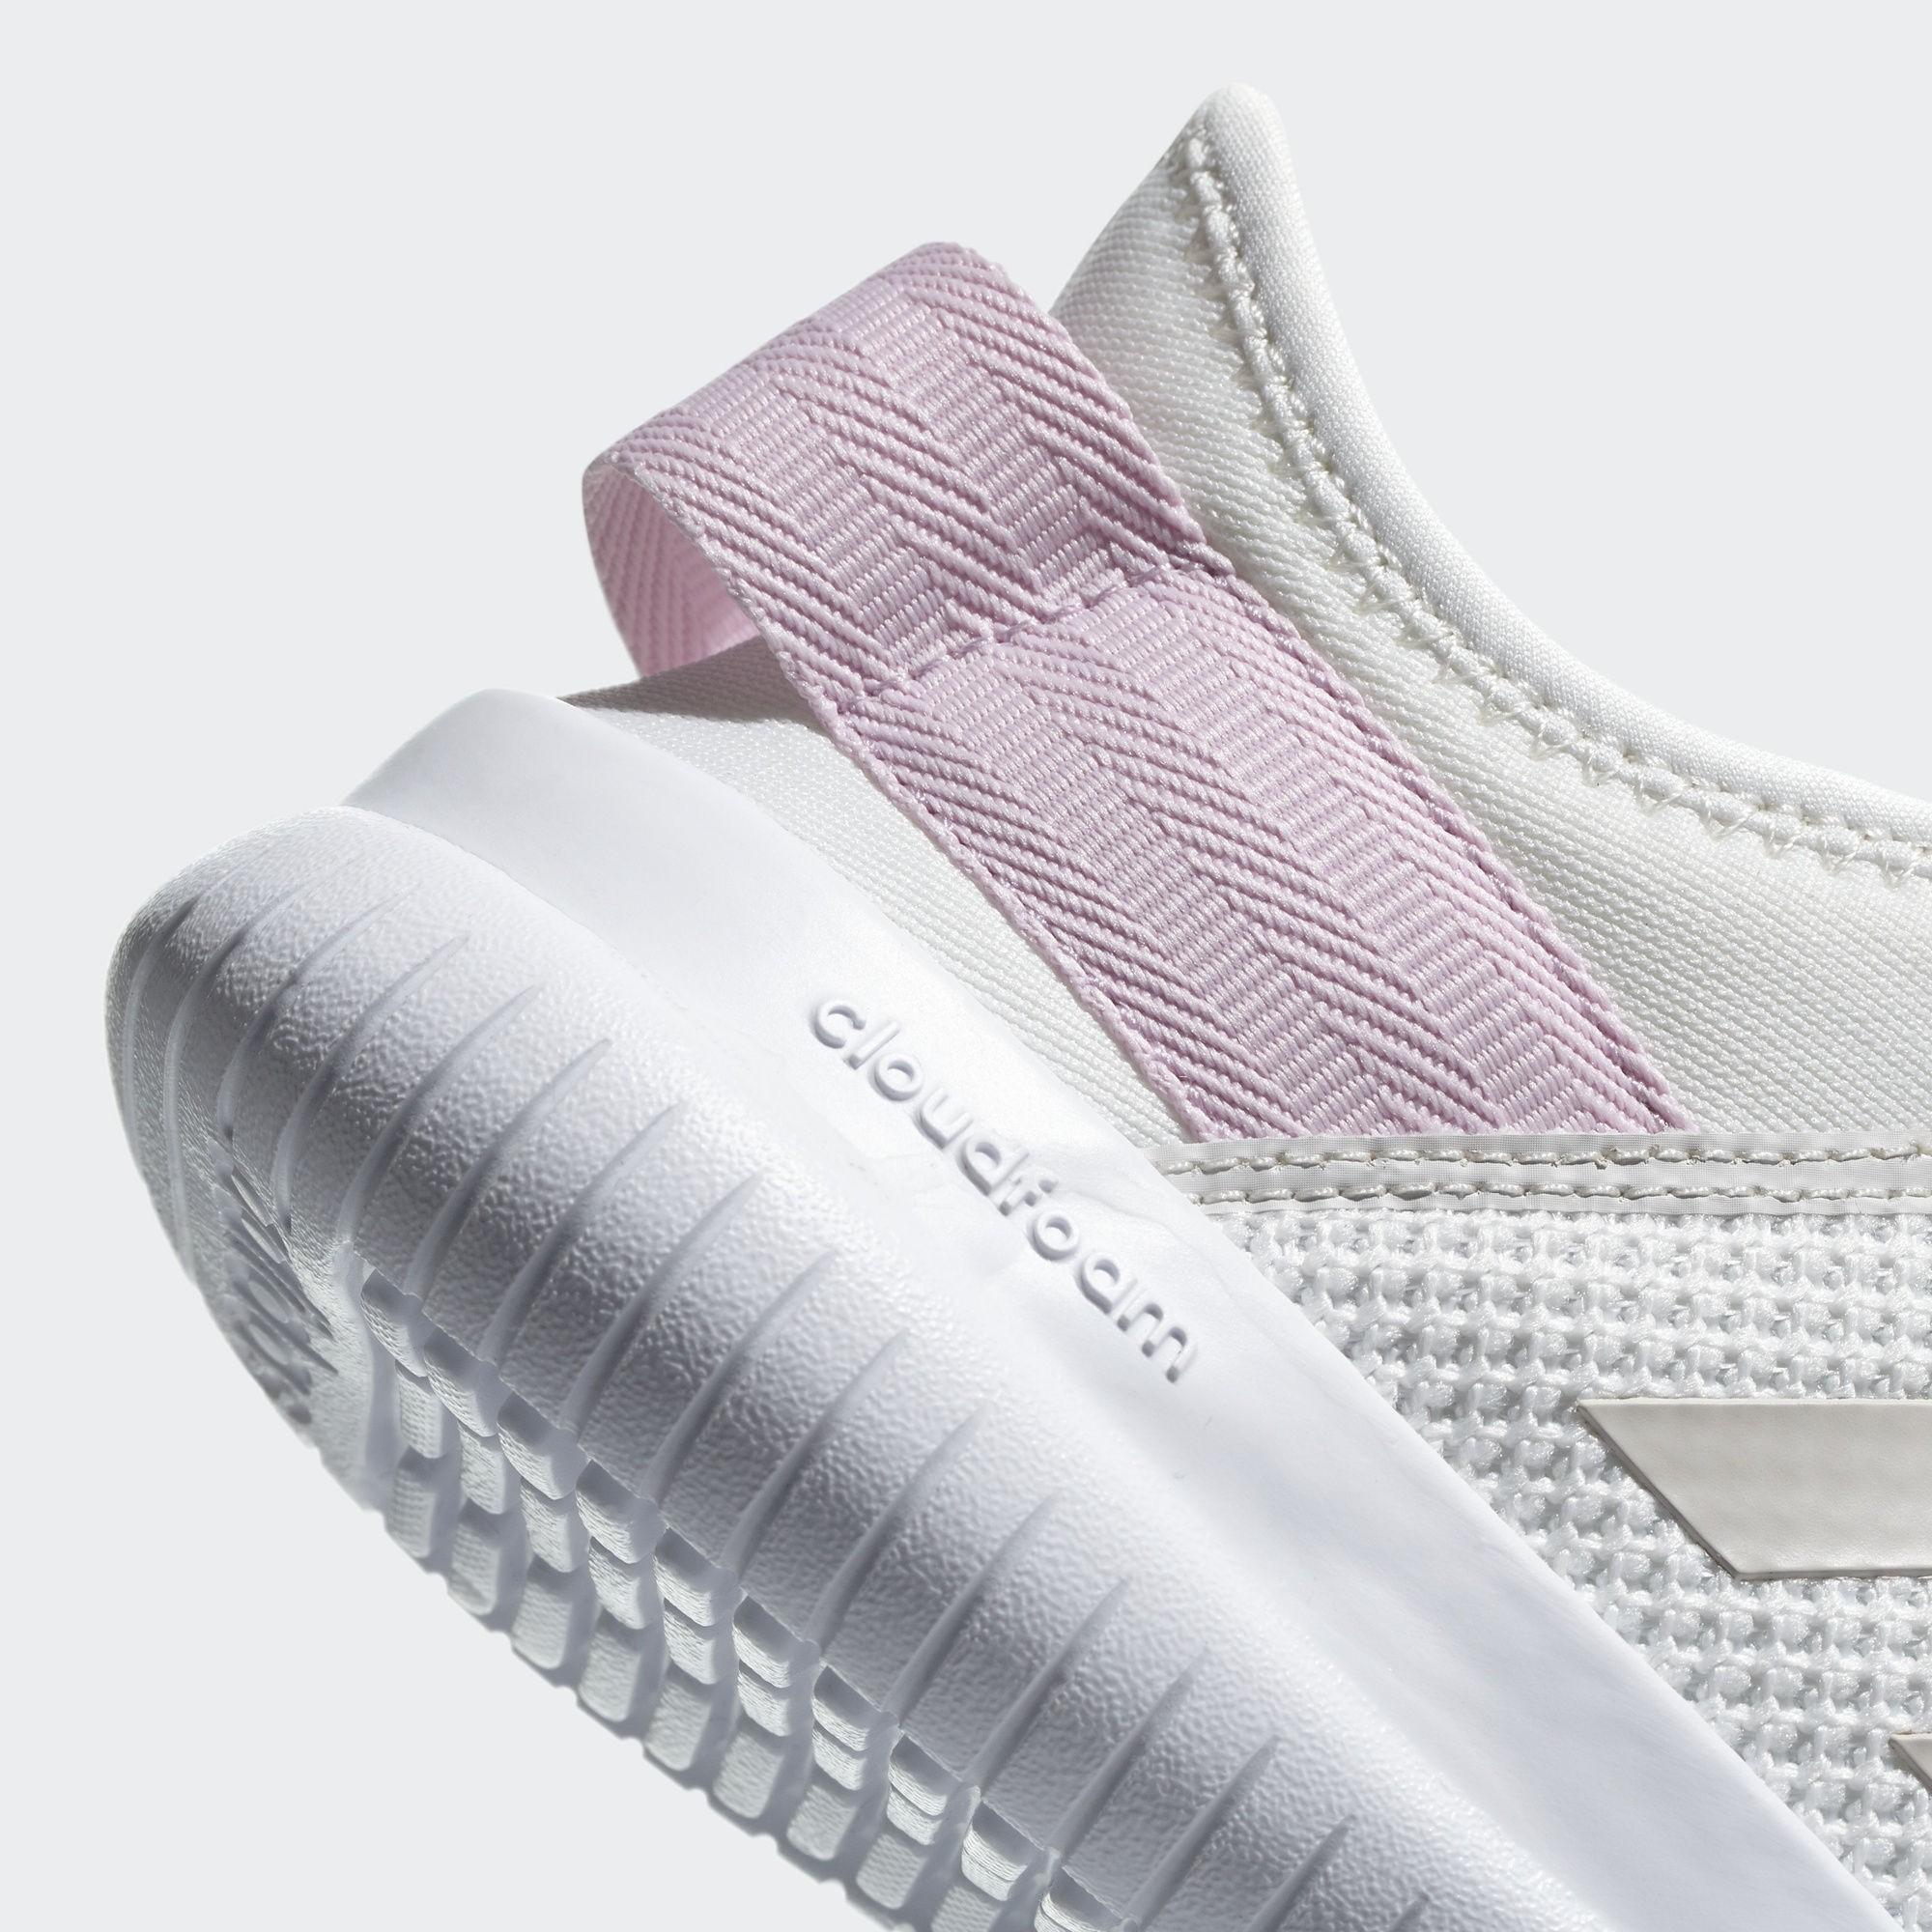 ... Adidas sepatu running Cloudfoam QT Flex W - DB0242 - white - 4